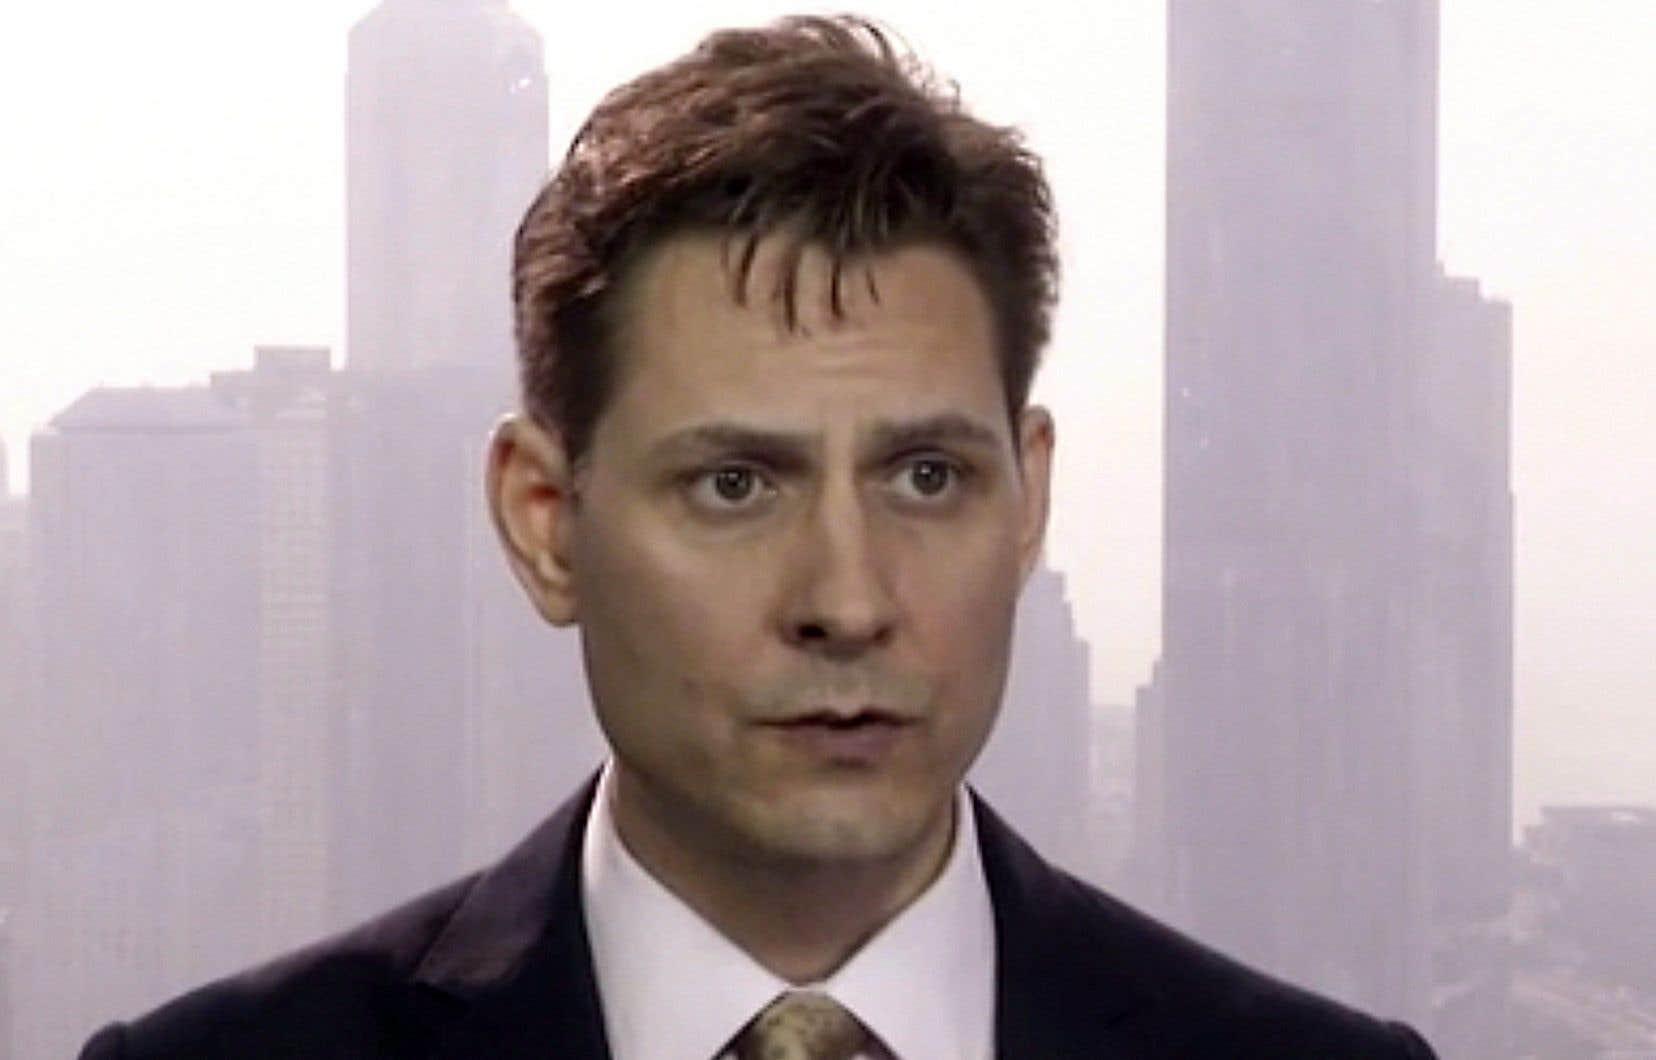 L'ex-diplomate canadien Michael Kovrig